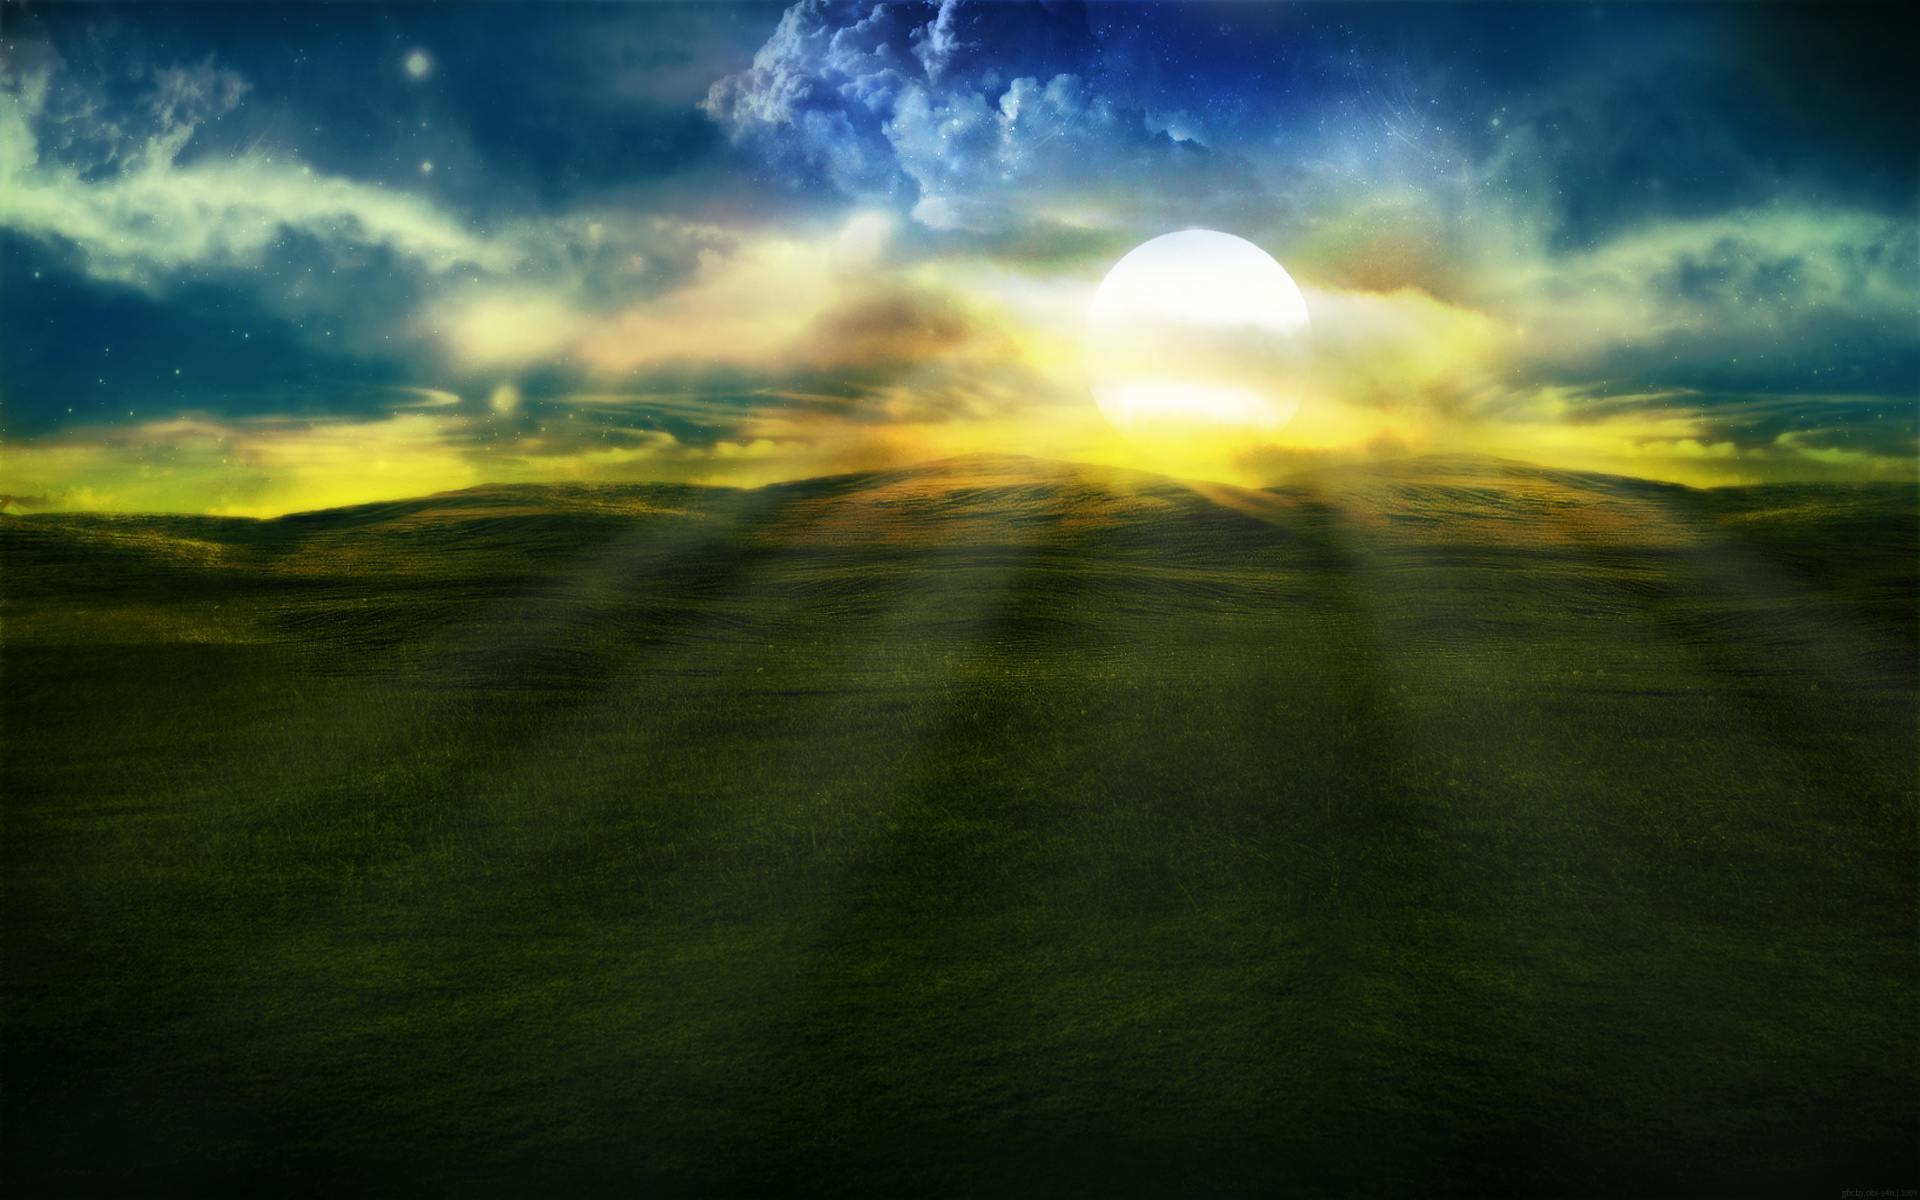 sun fantasy wallpaper 22630